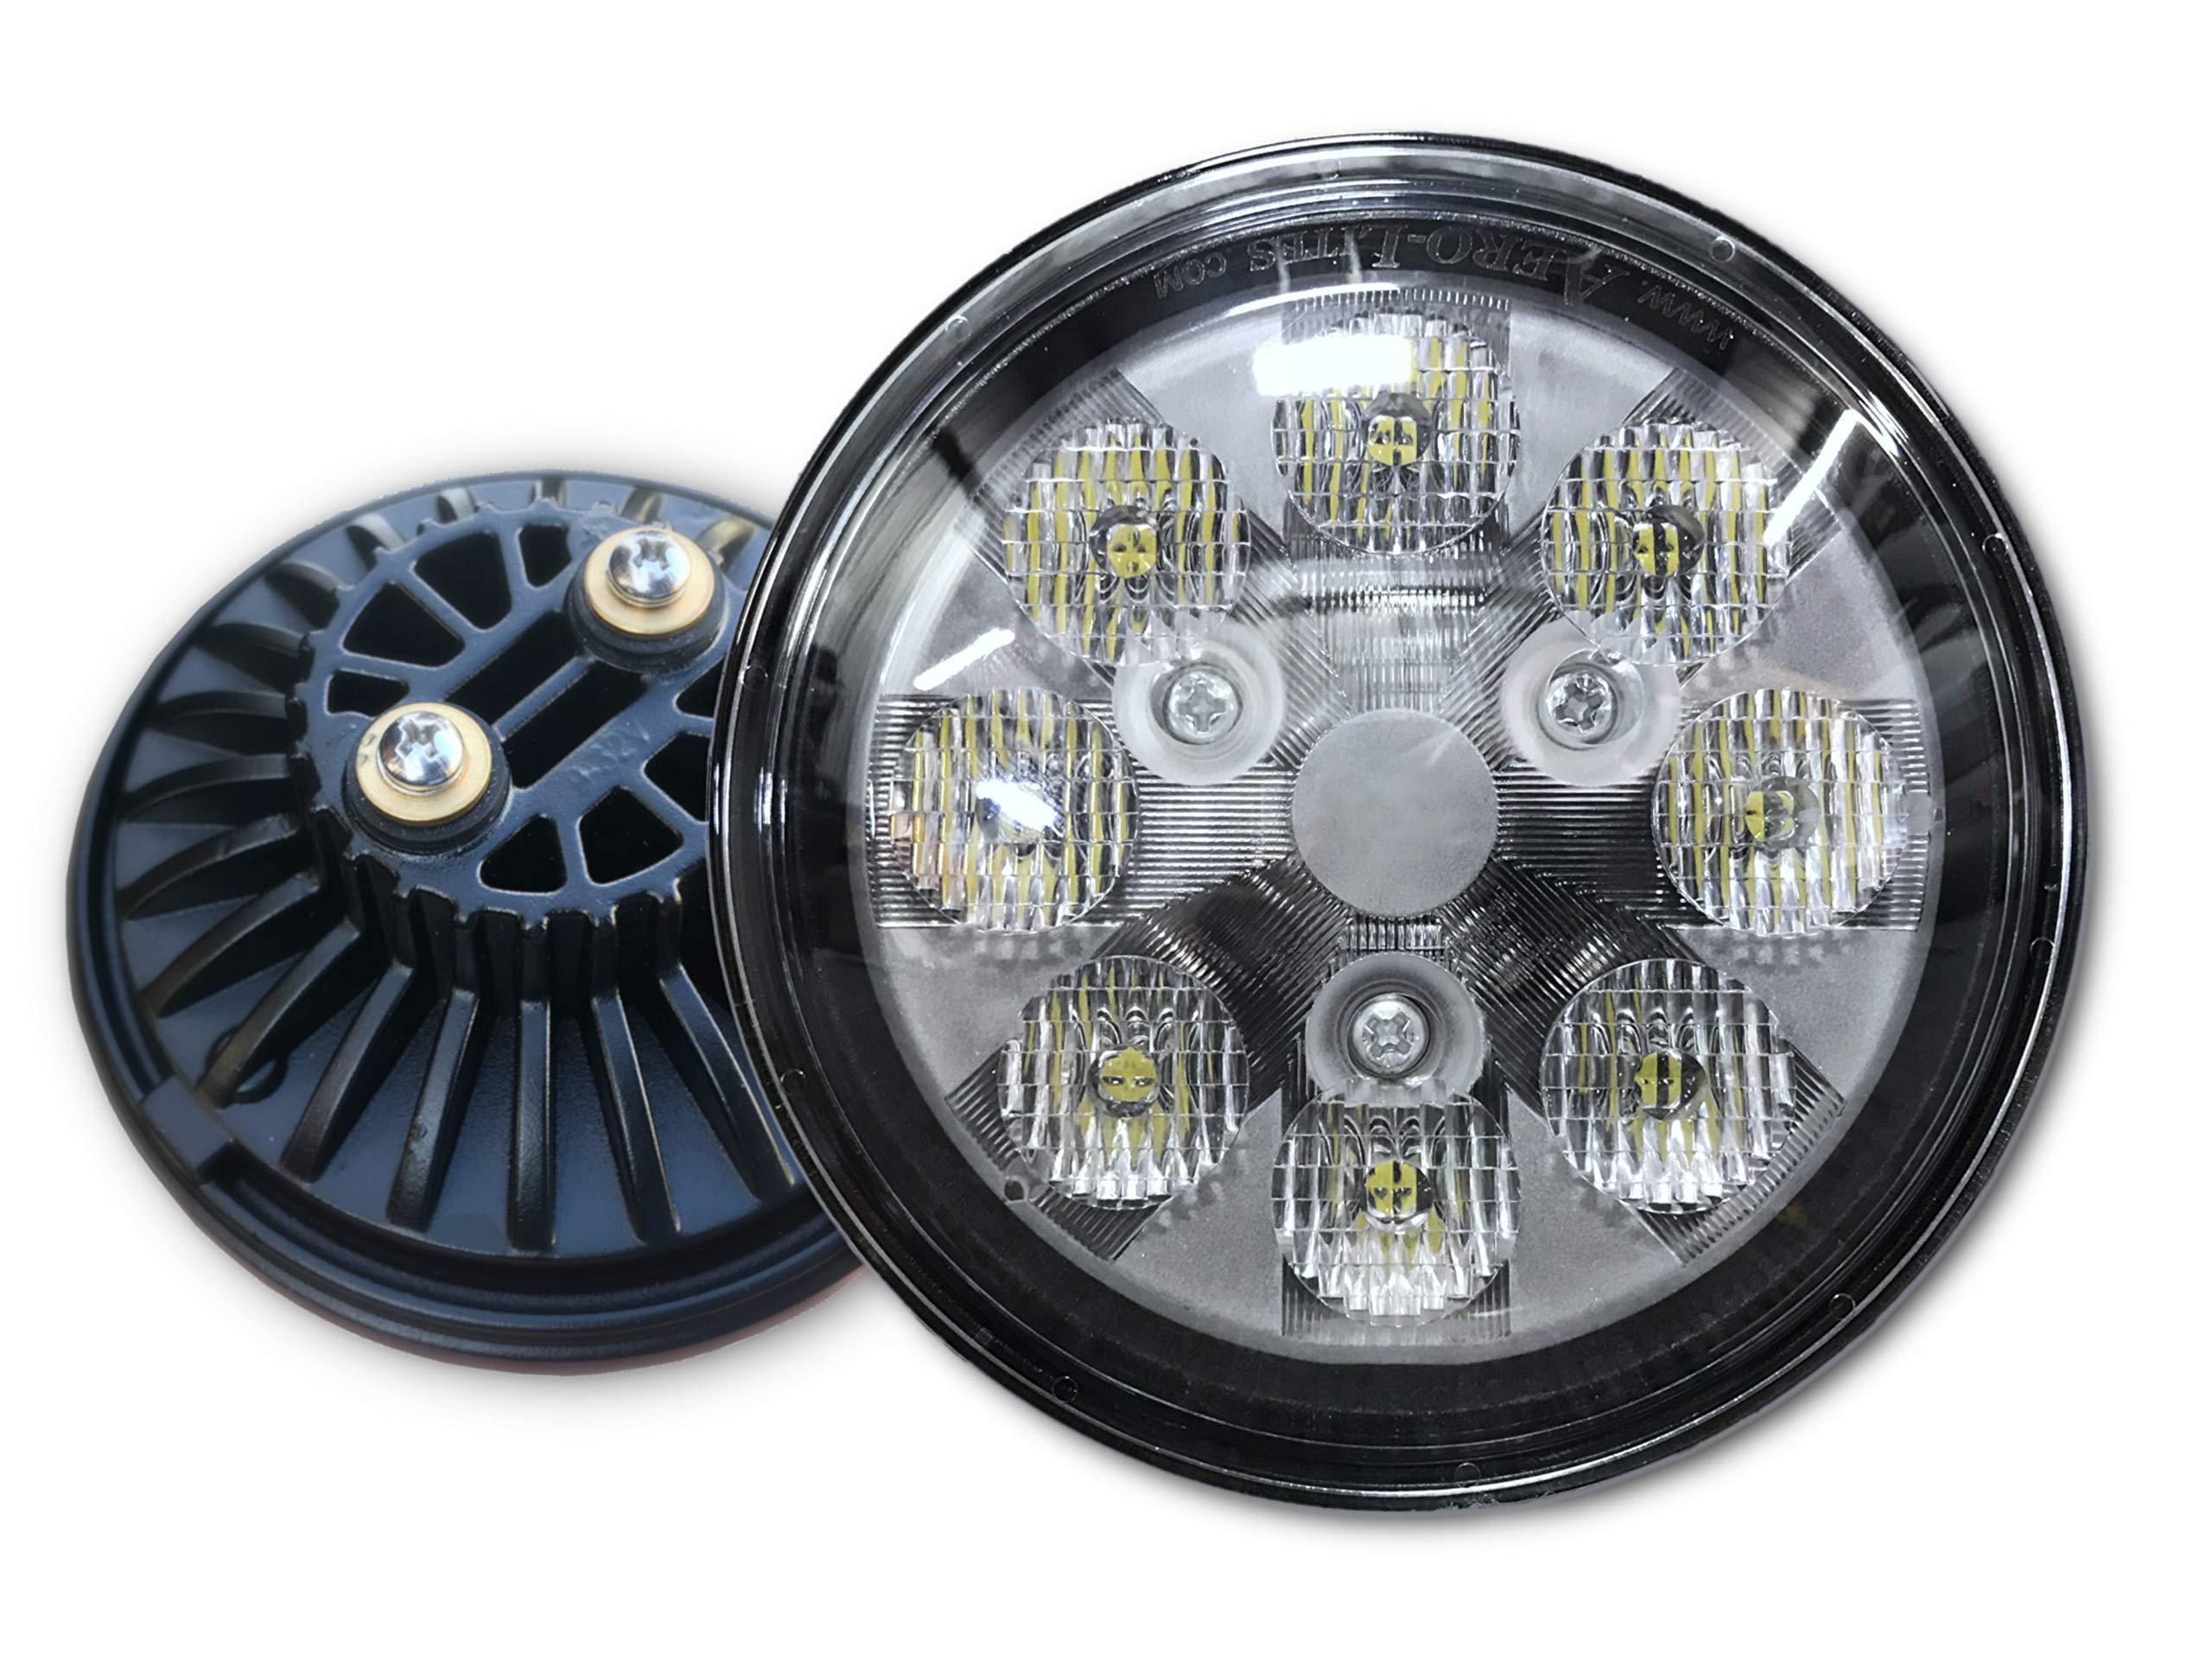 LED Taxi Light for Aircraft - Aero-Lites SunSetter + Plus PAR 36 40W 10-30VDC